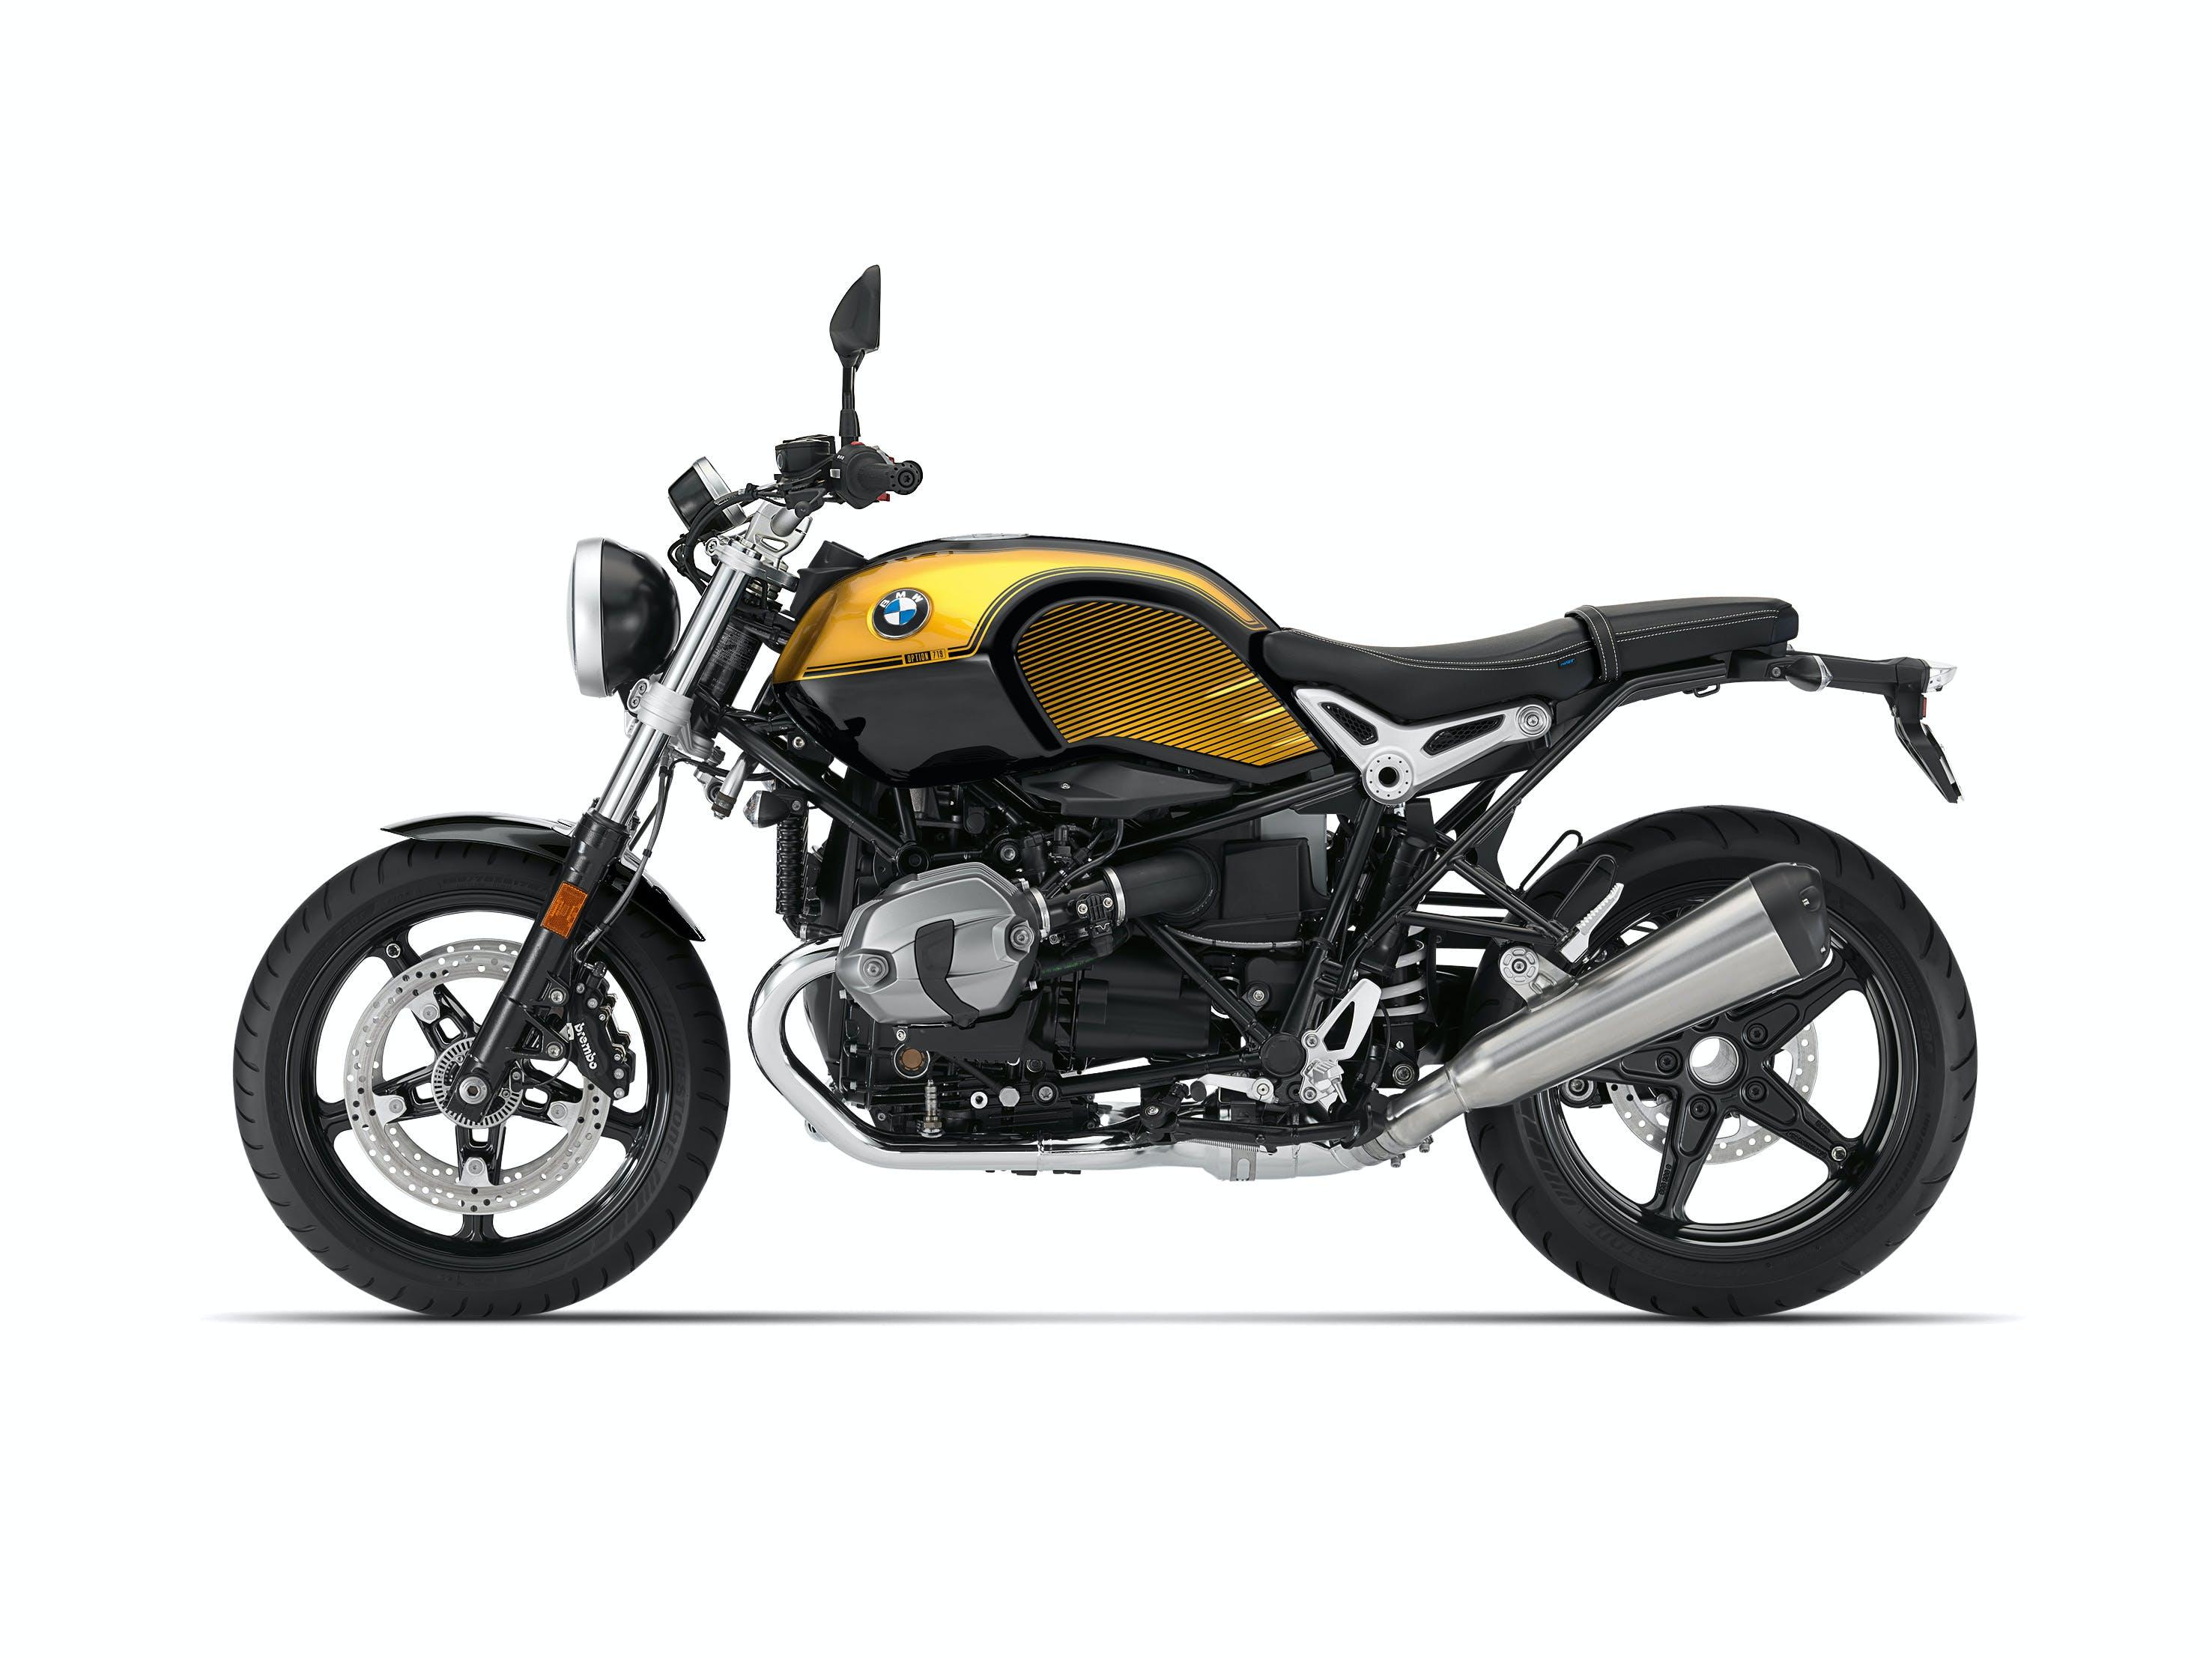 BMW R NINET PURE SPEZIAL in opt 719 black storm metallic / aurum colour